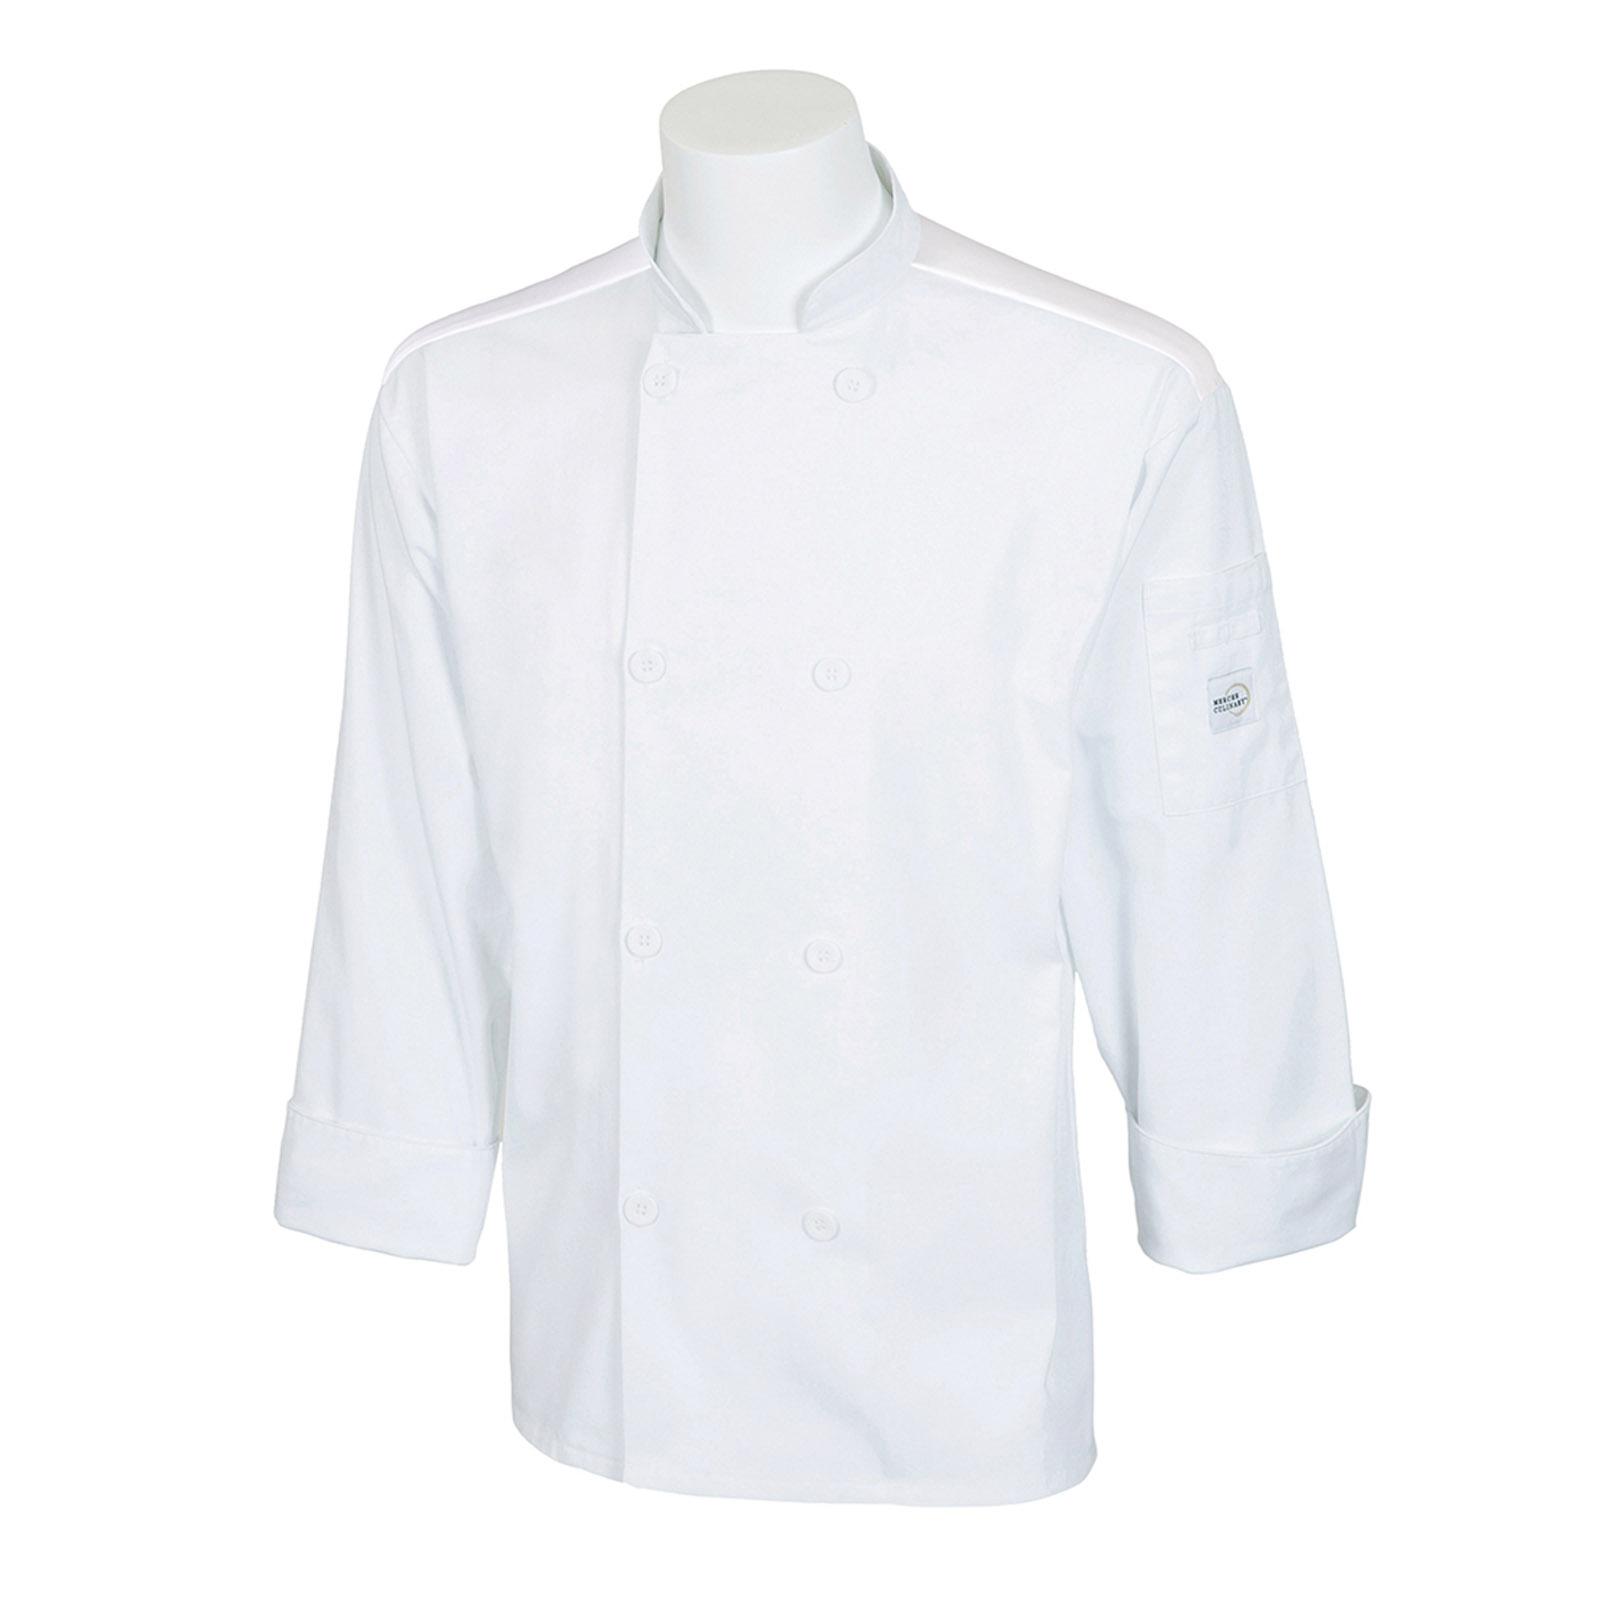 Mercer Culinary M60017WHXS chef's coat